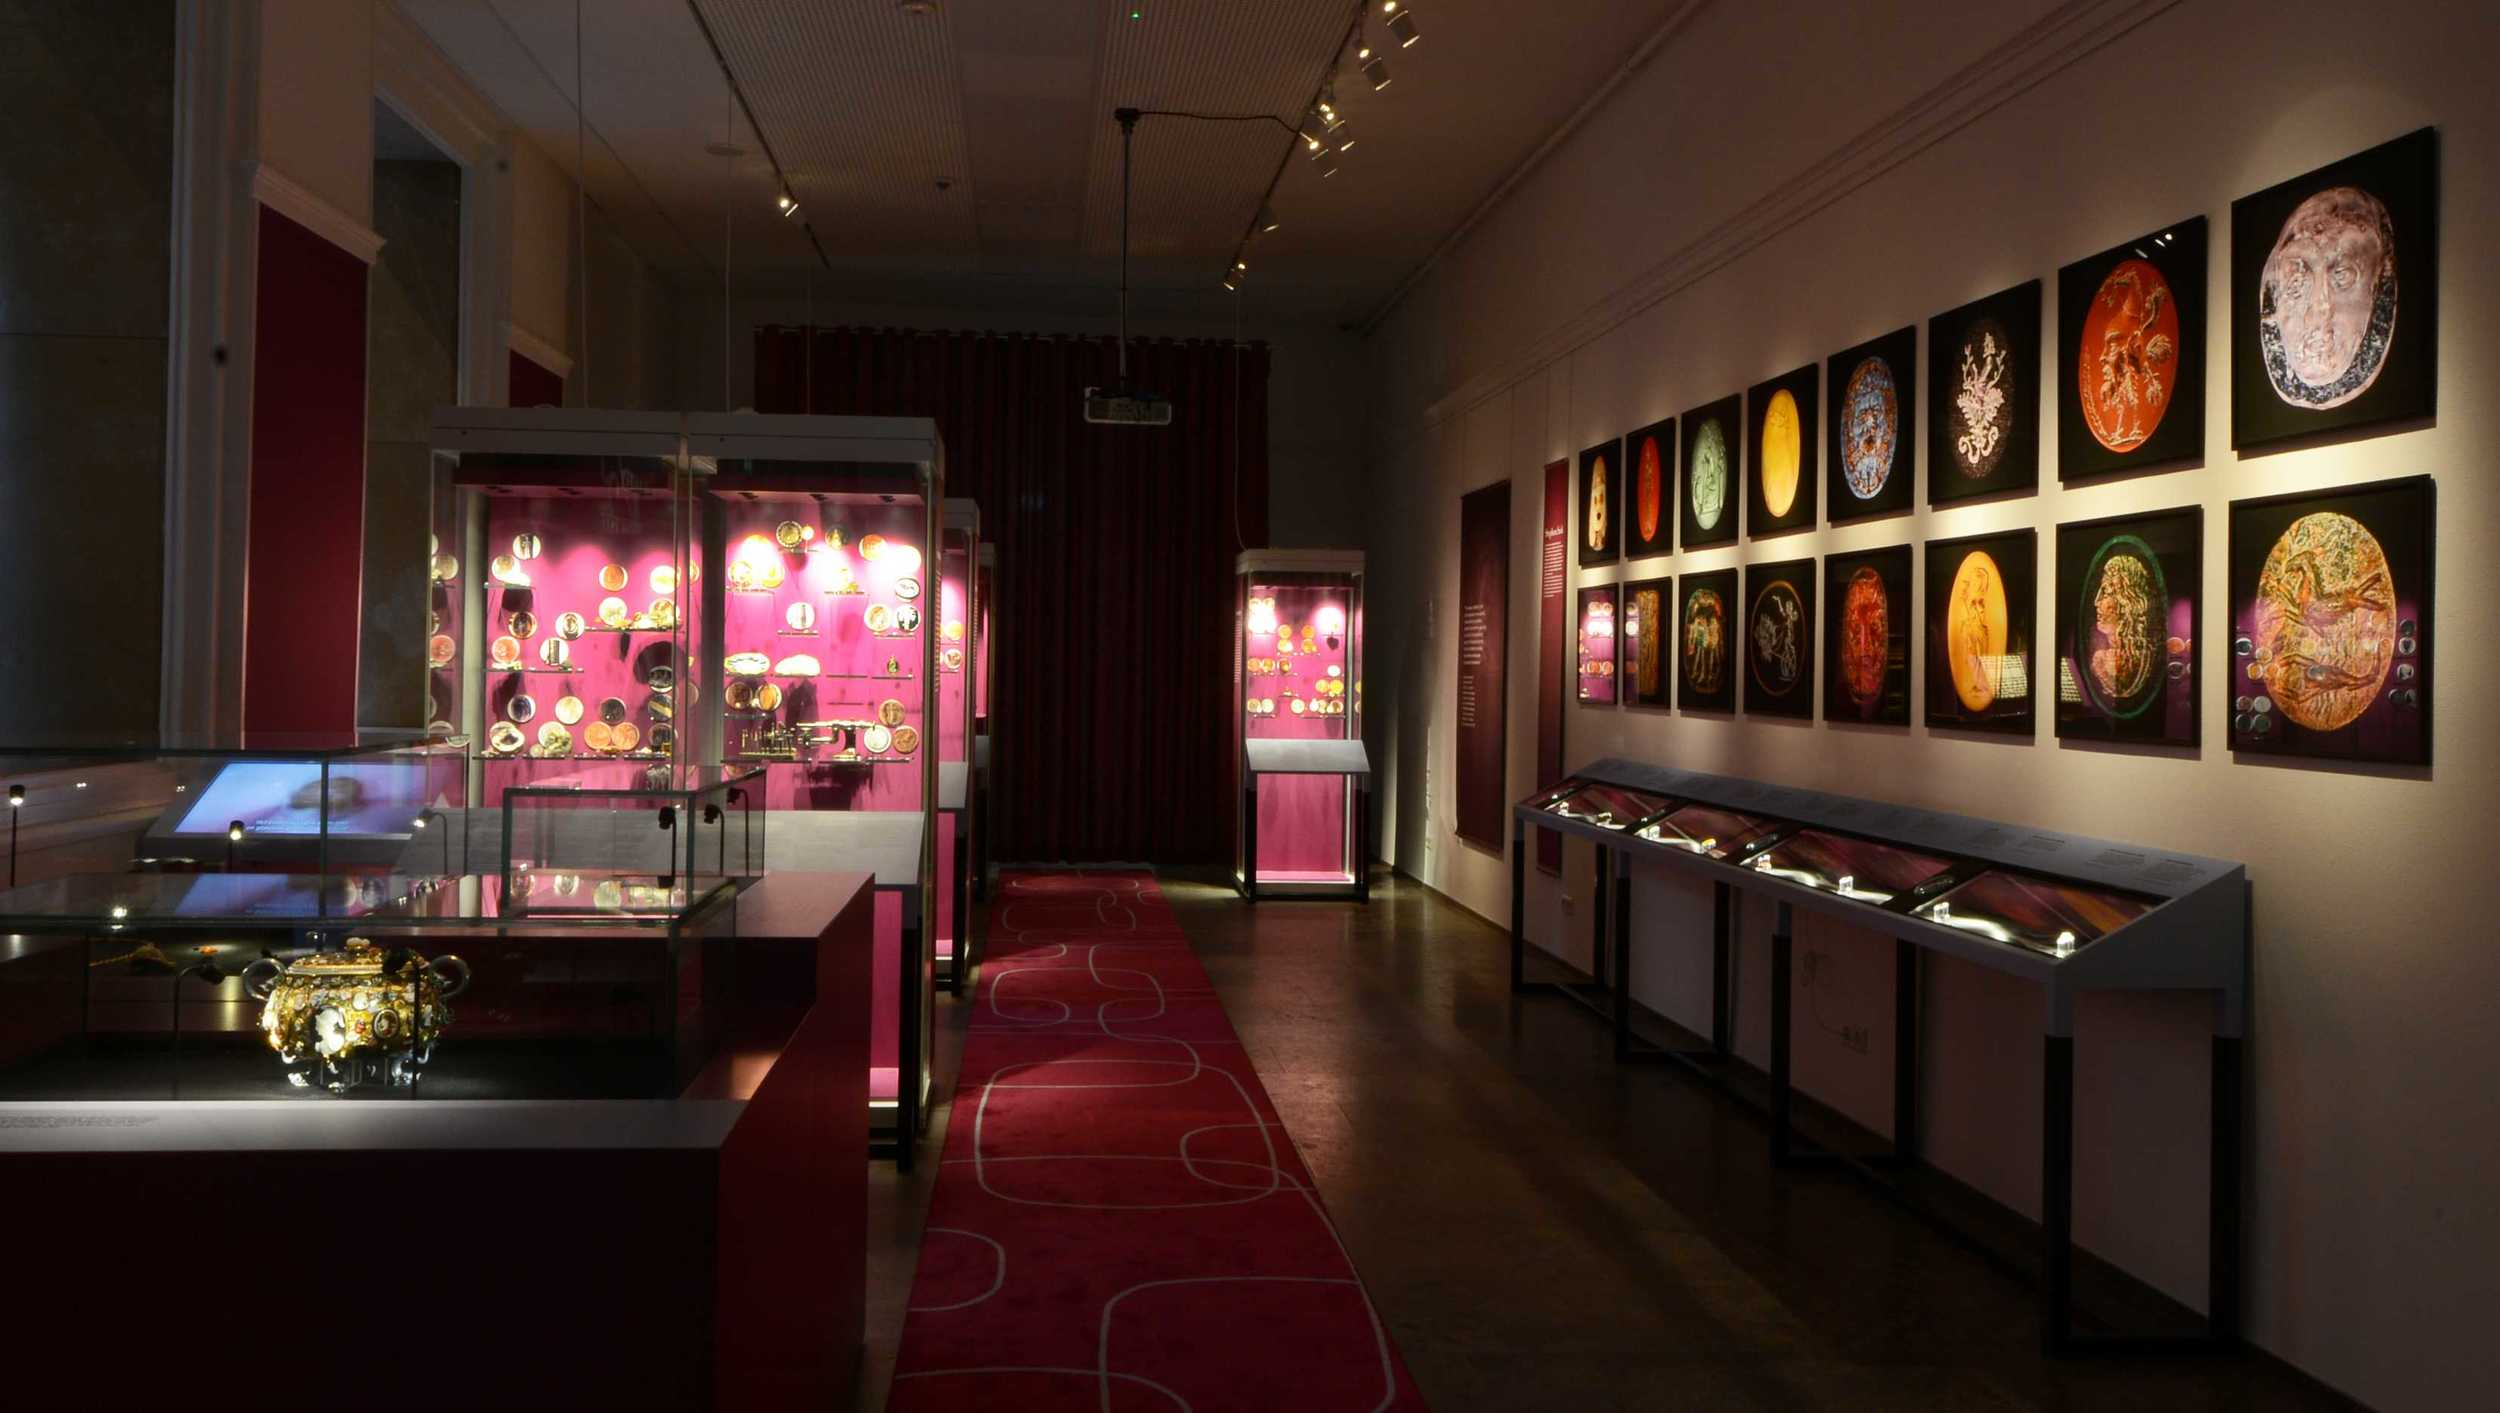 Overzicht van te tentoonstelling Pracht & Precisie (foto: RMO)